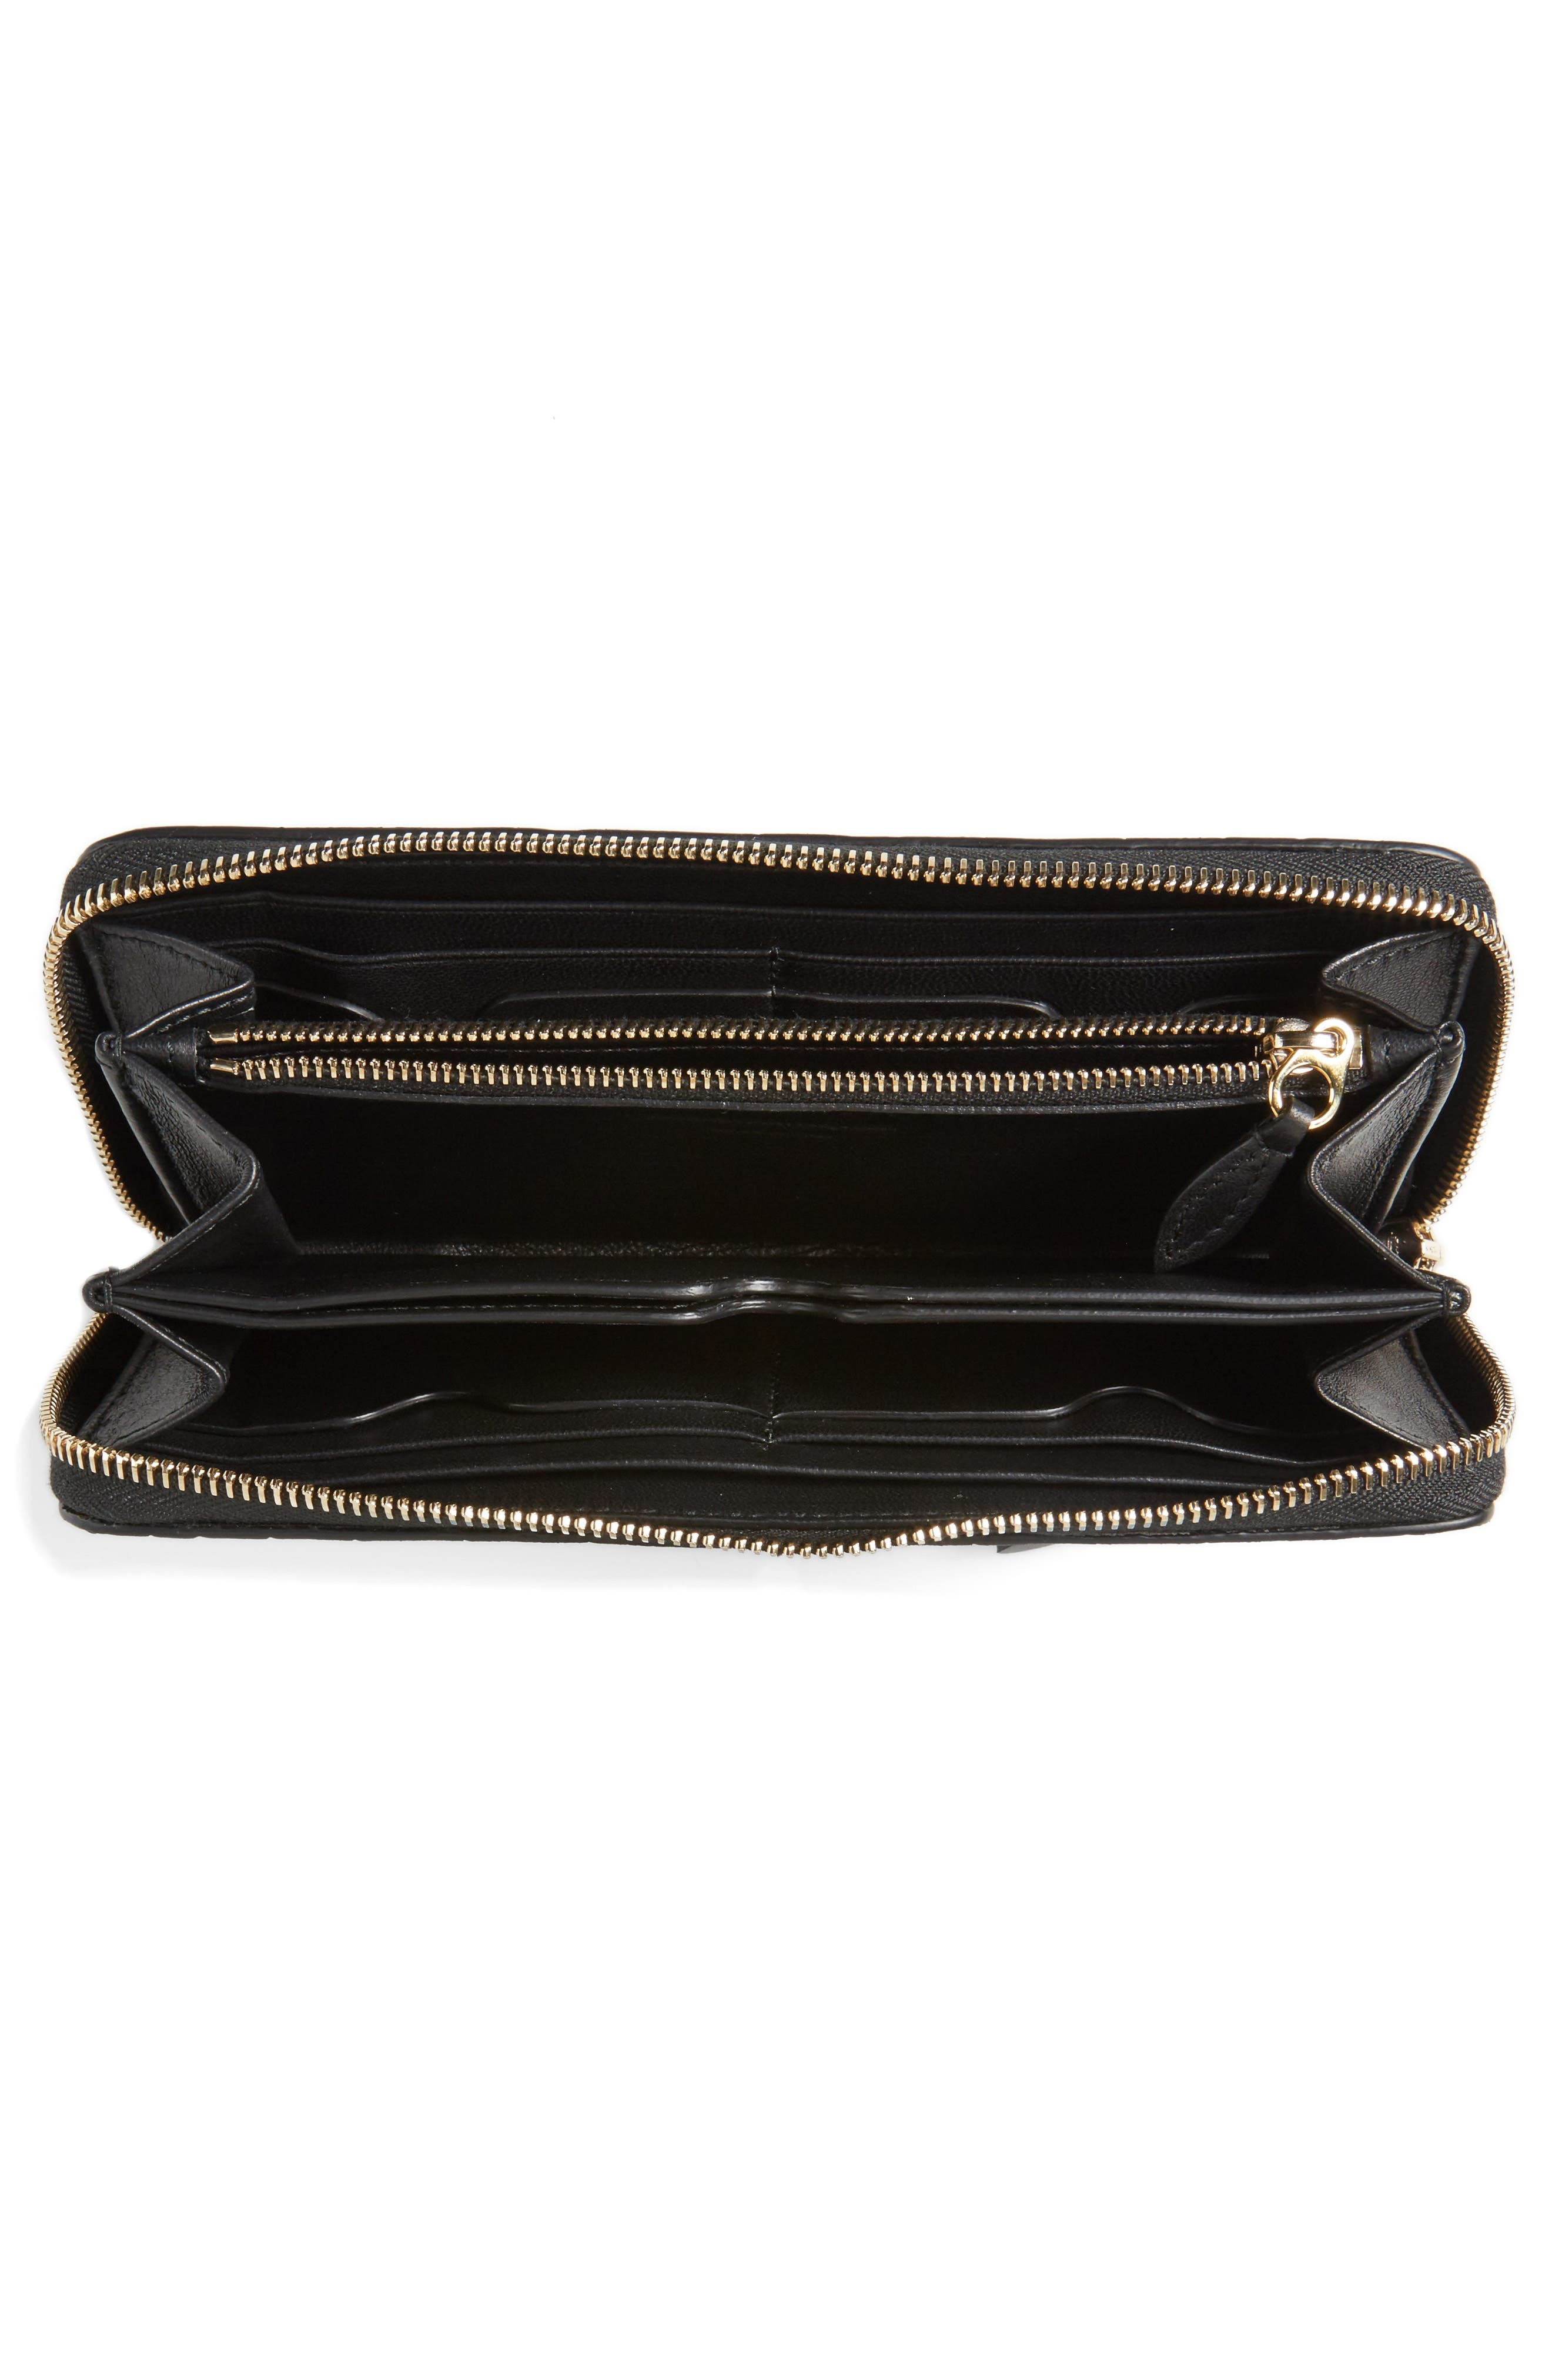 Croc-Embossed Leather Zip Around Wallet,                             Alternate thumbnail 2, color,                             BLACK